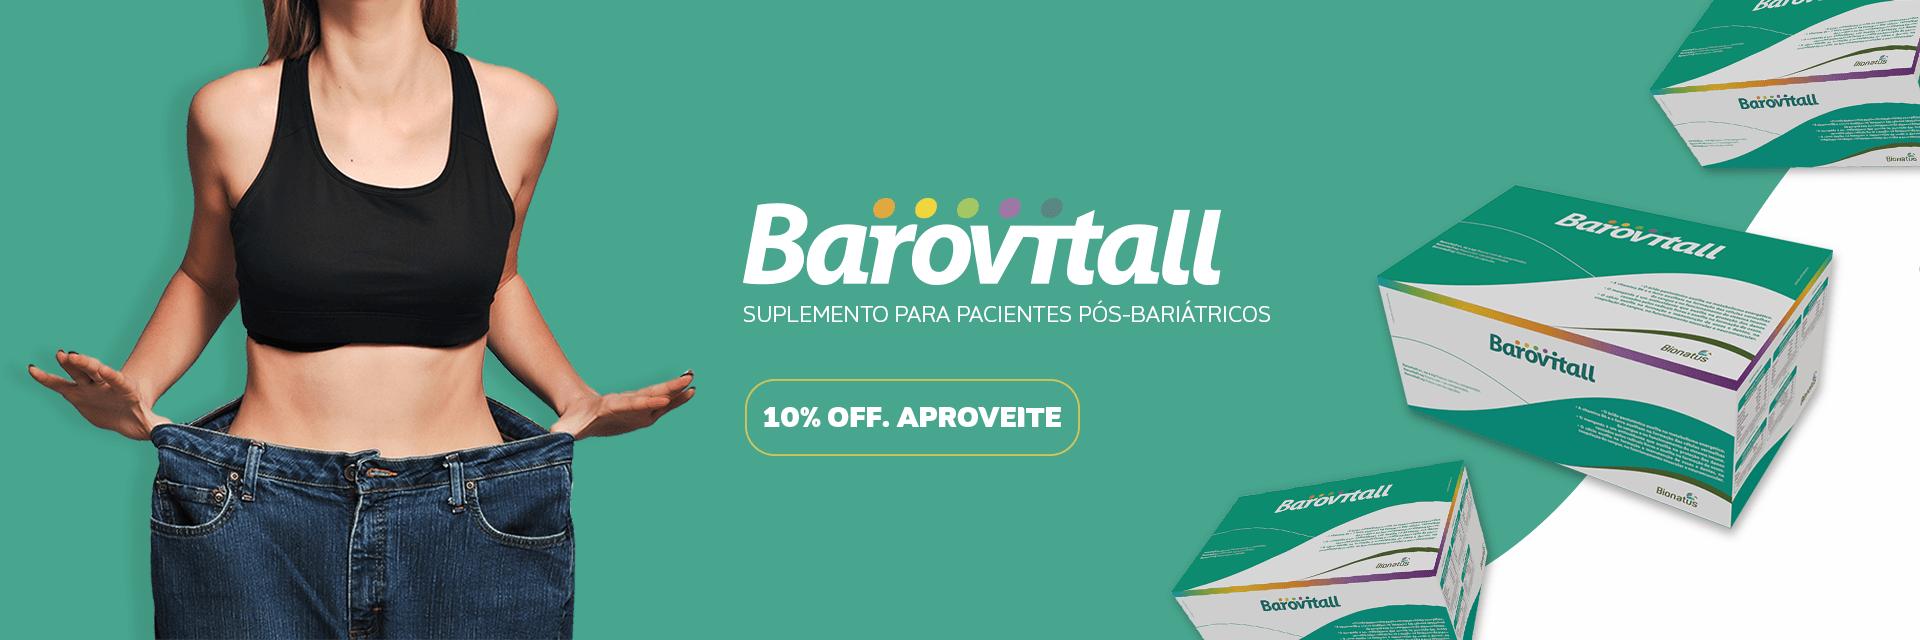 Barovitall 10%